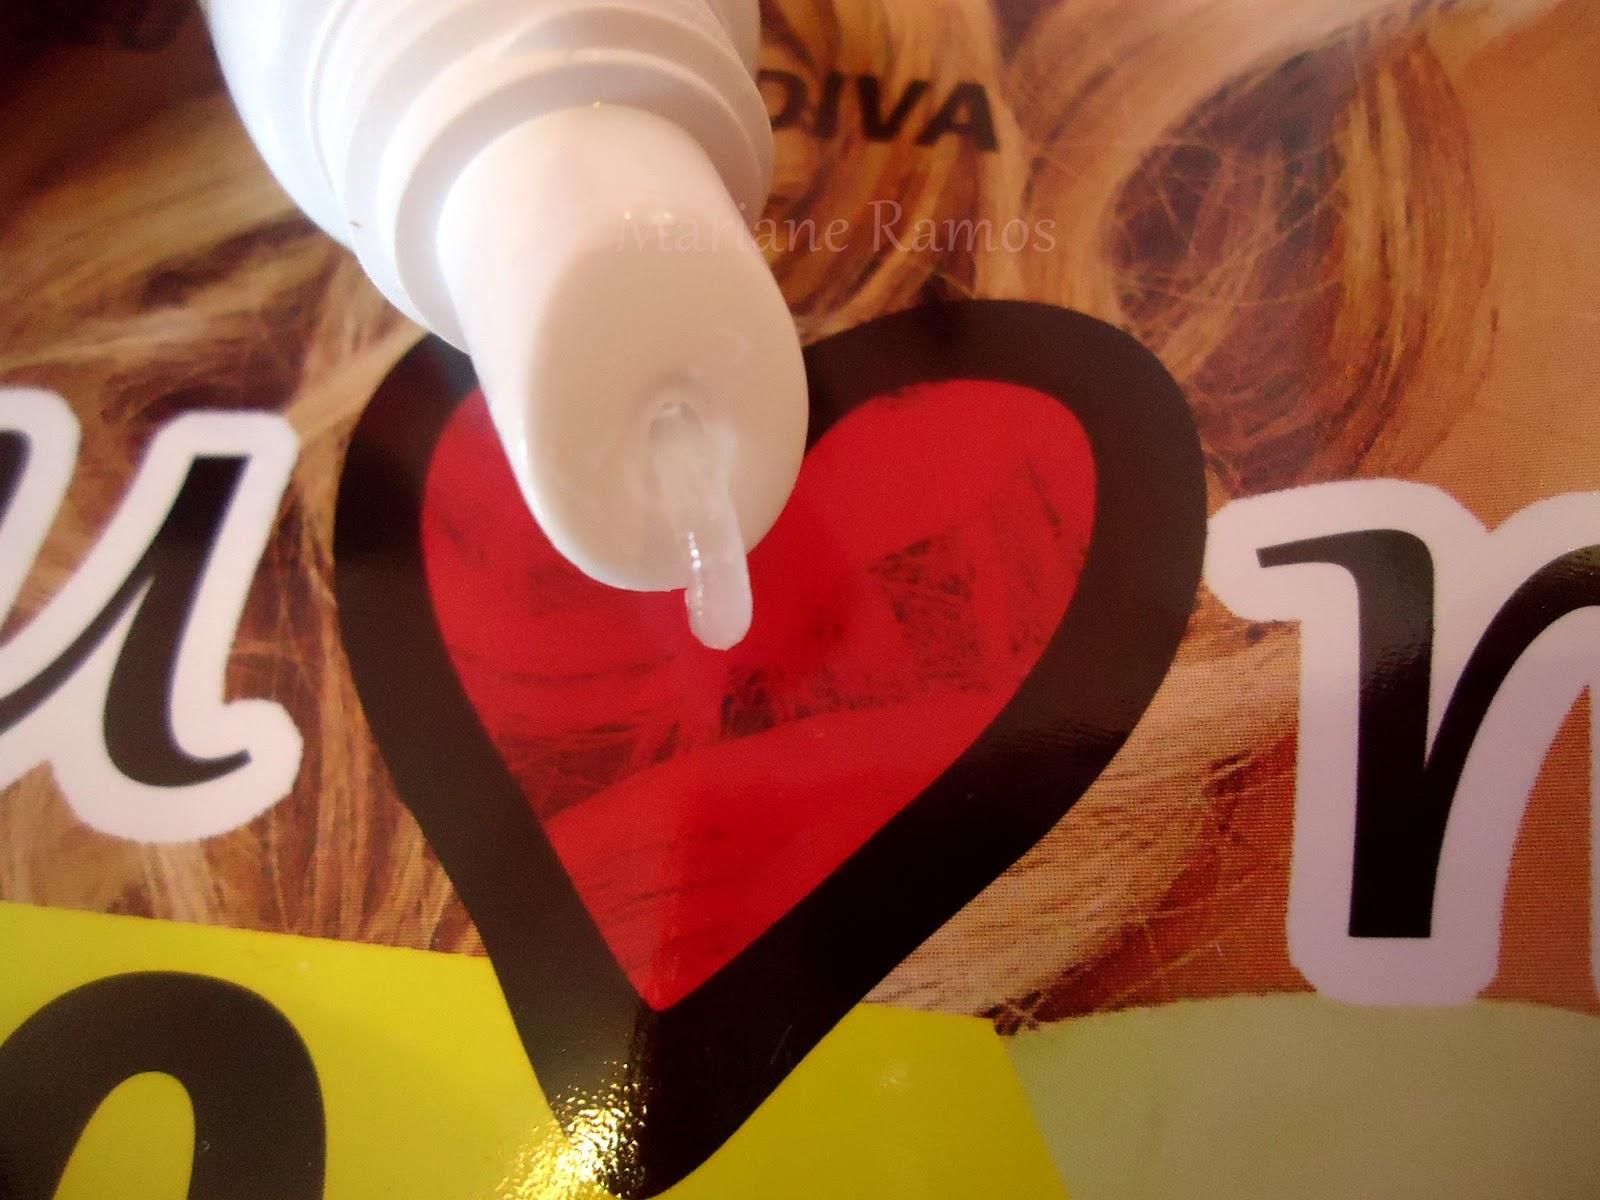 hidratante labial geléia real avon